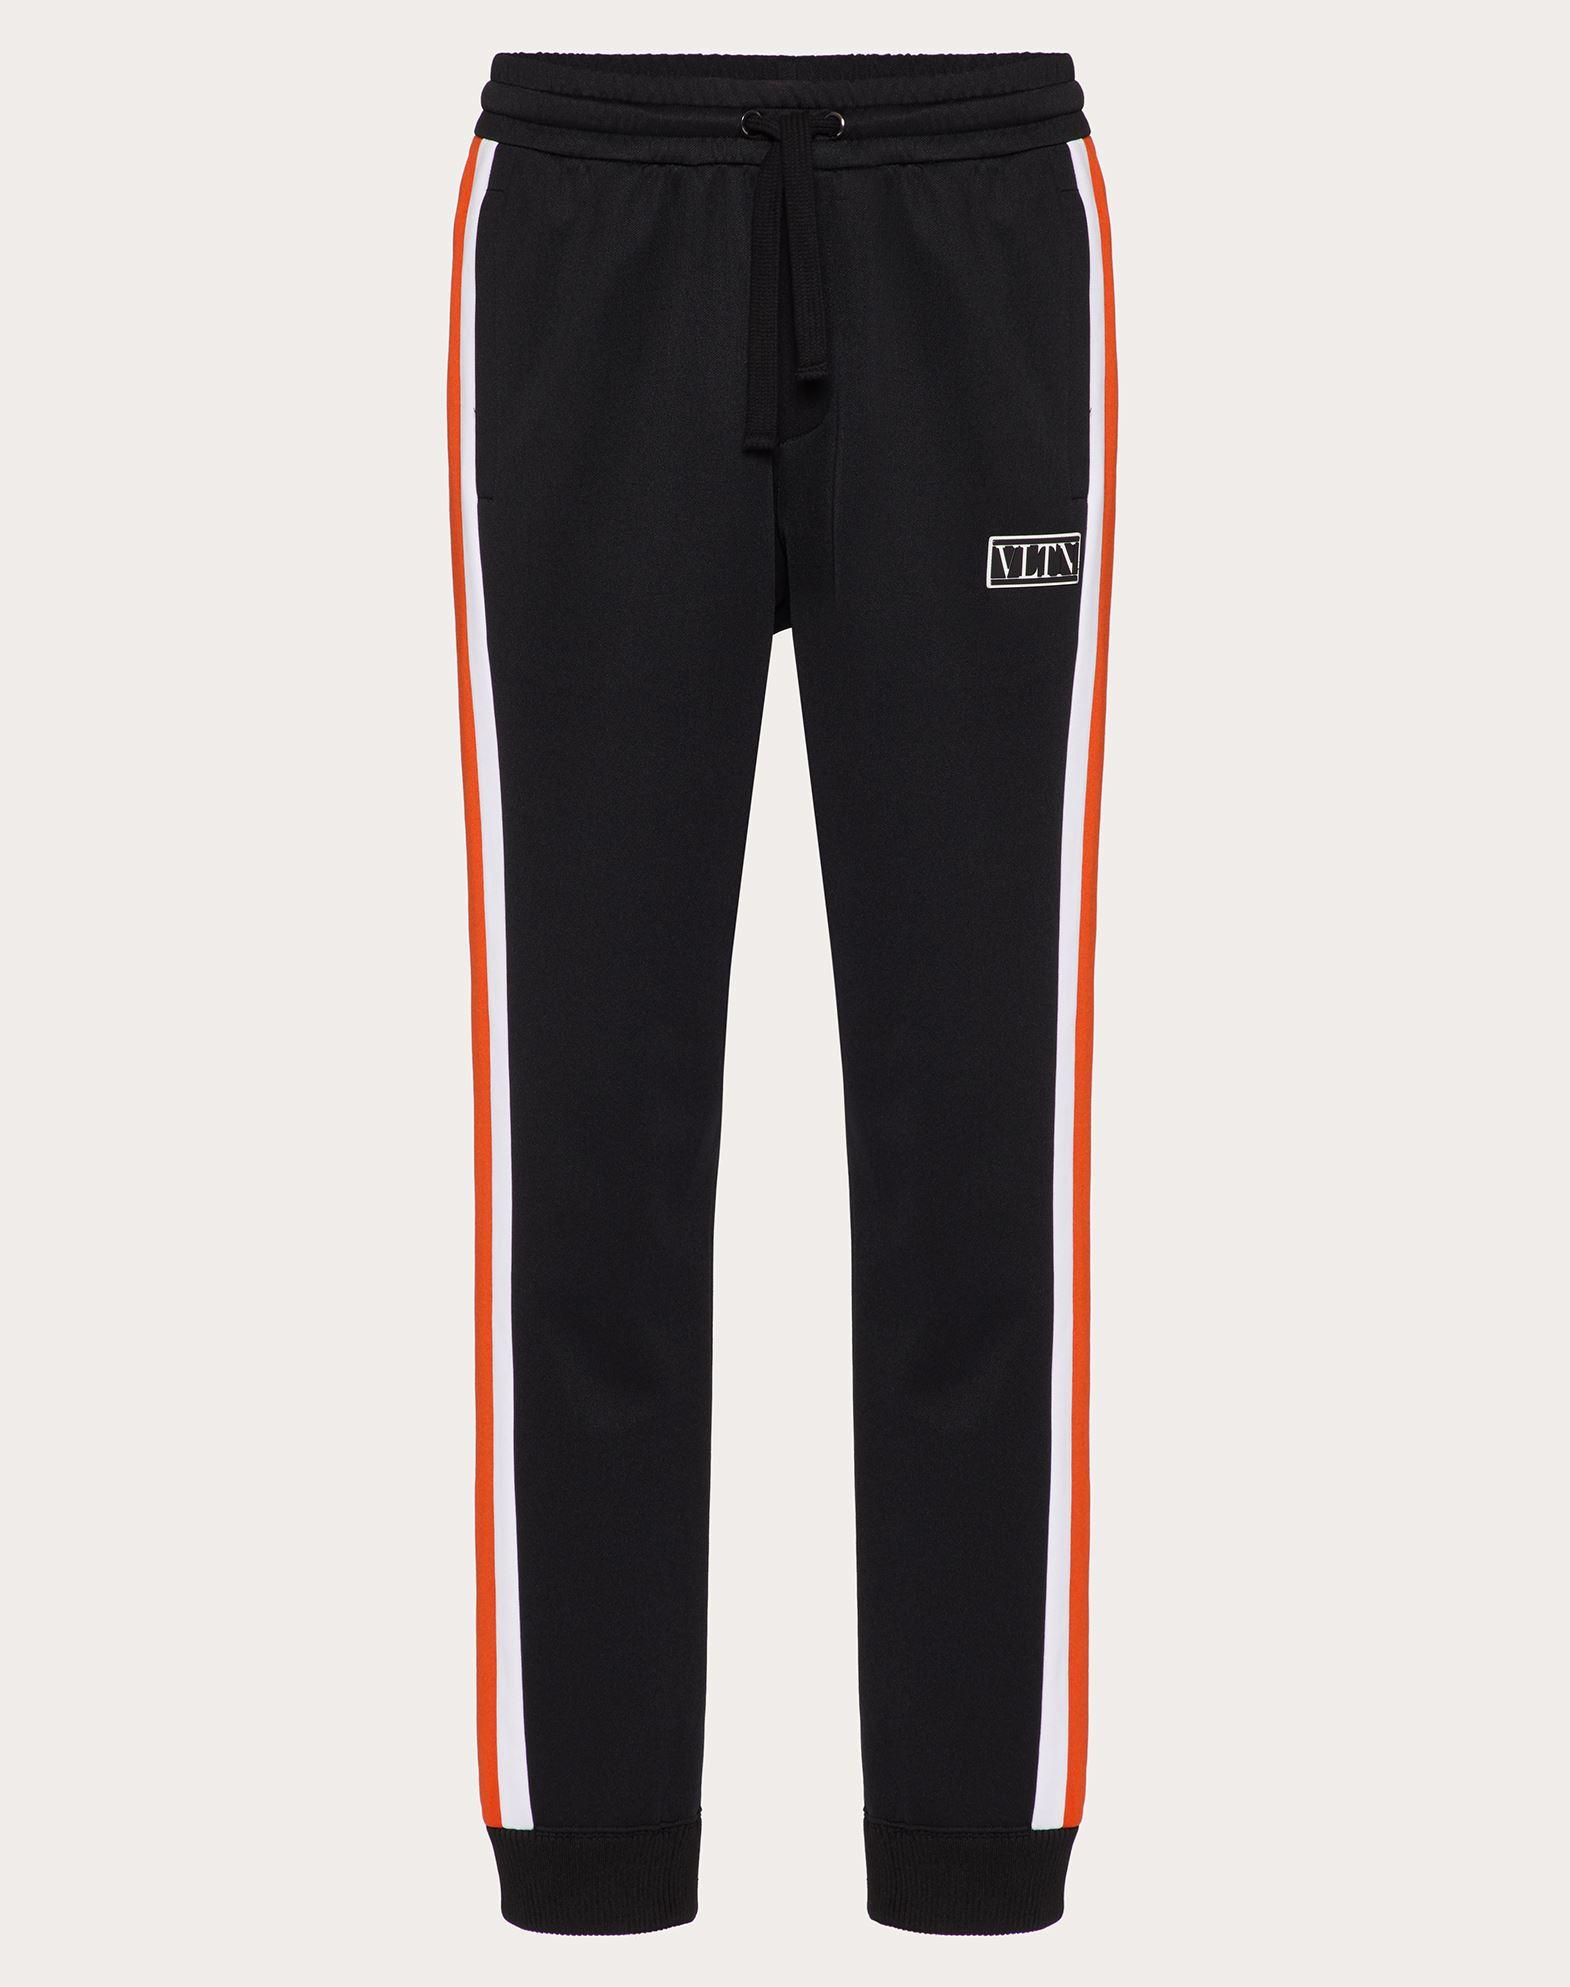 Valentino Uomo Technical Cotton Pants With Vltn Tag Color Block In Black/neon Orange